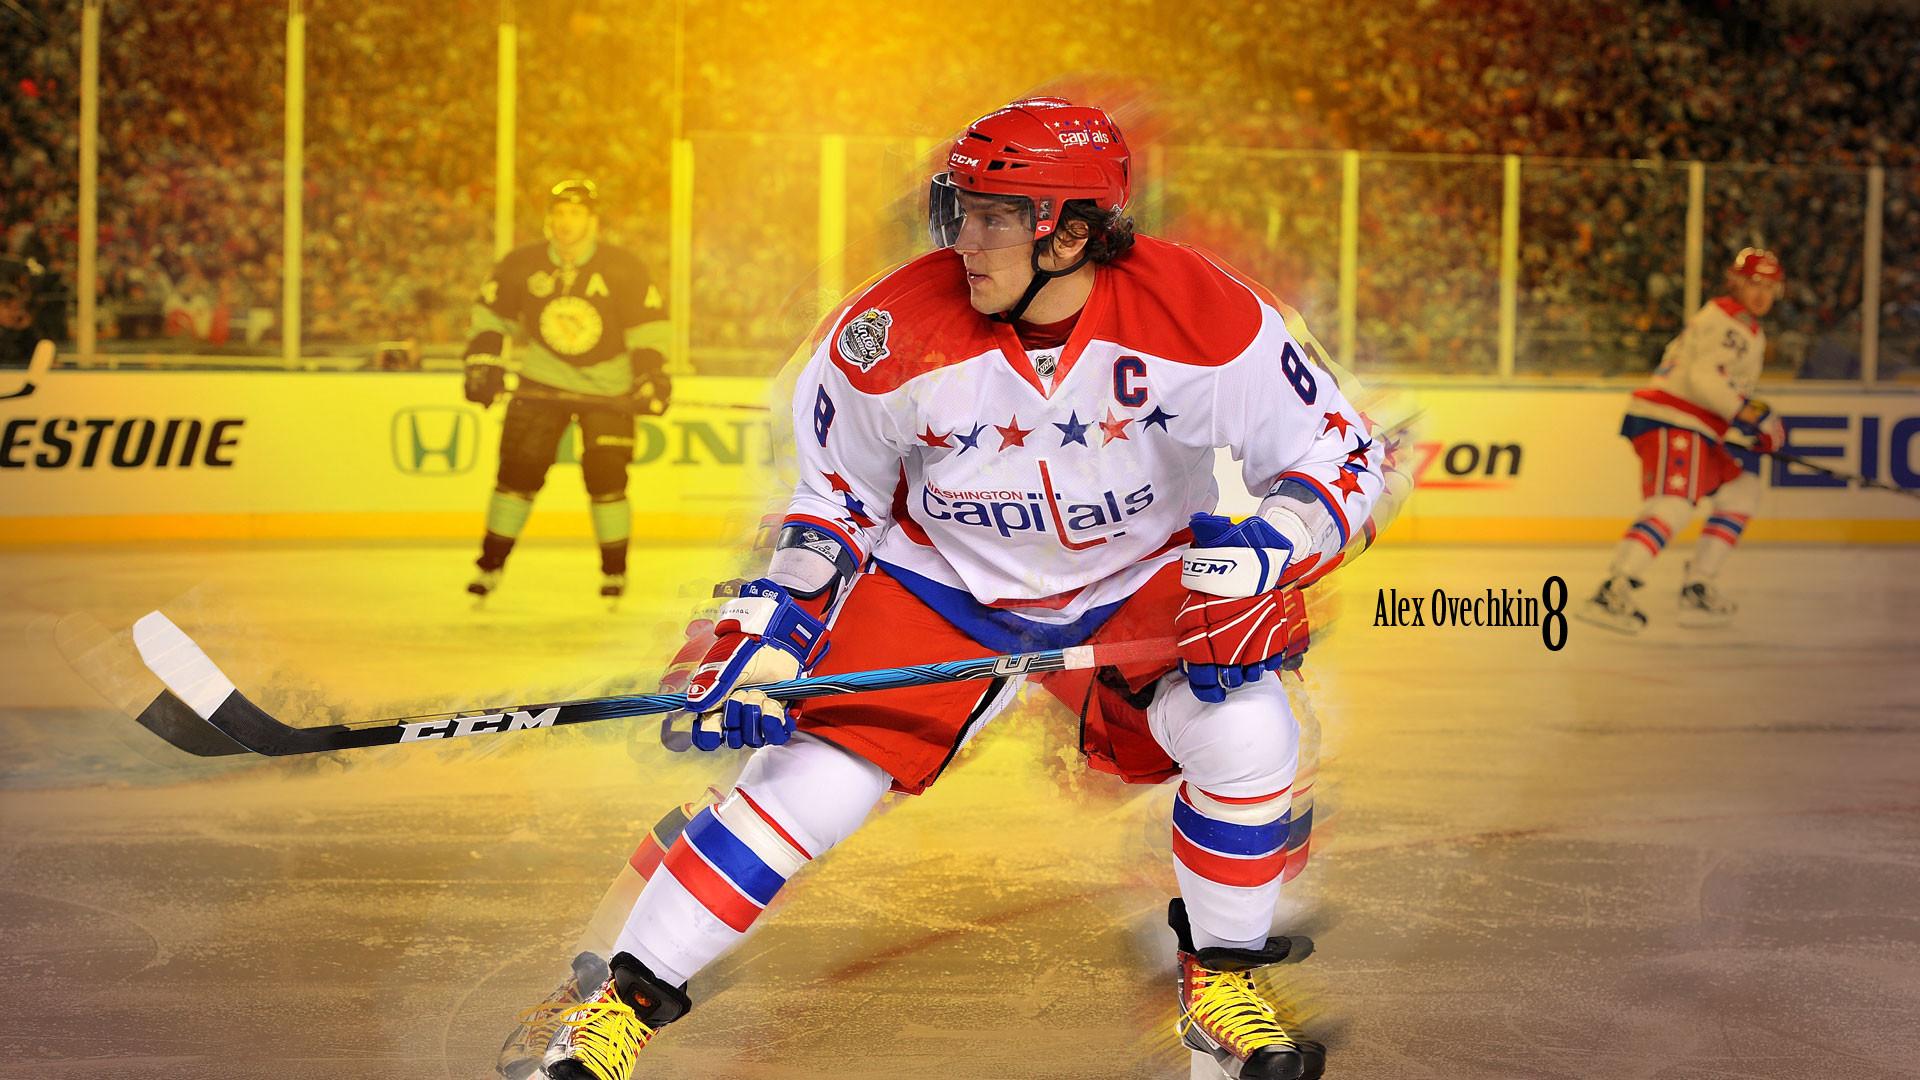 NHL Wallpapers – Alexander Ovechkin Capitals wallpaper